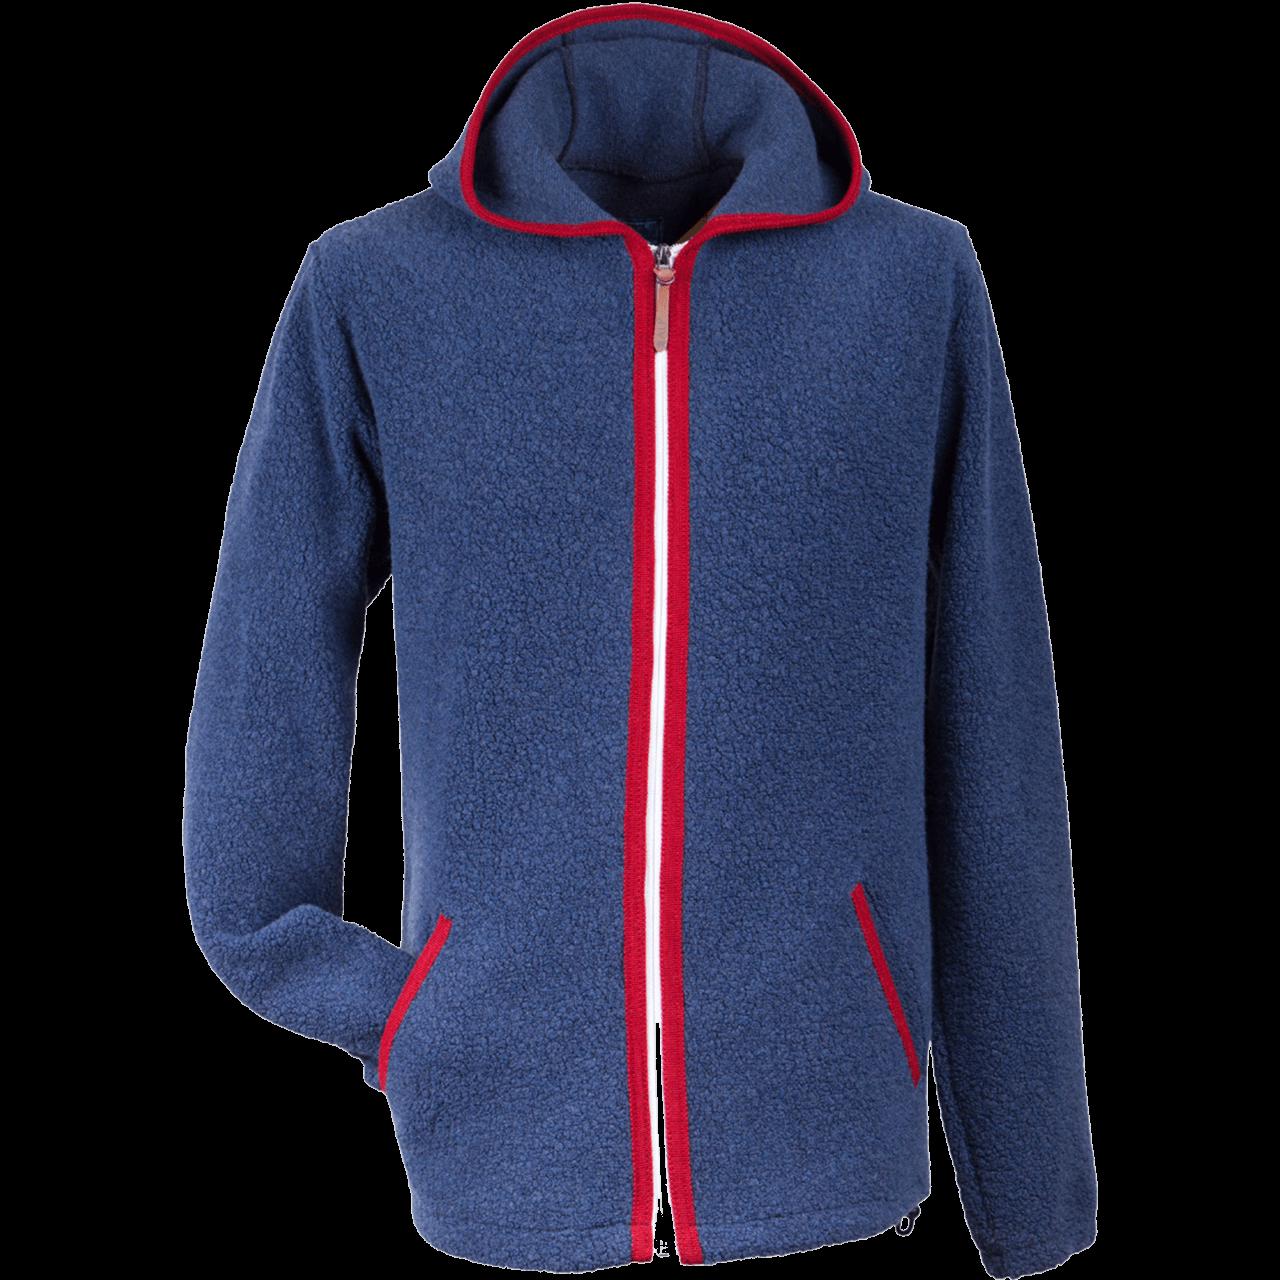 giacca-uomo-338801-alp1964